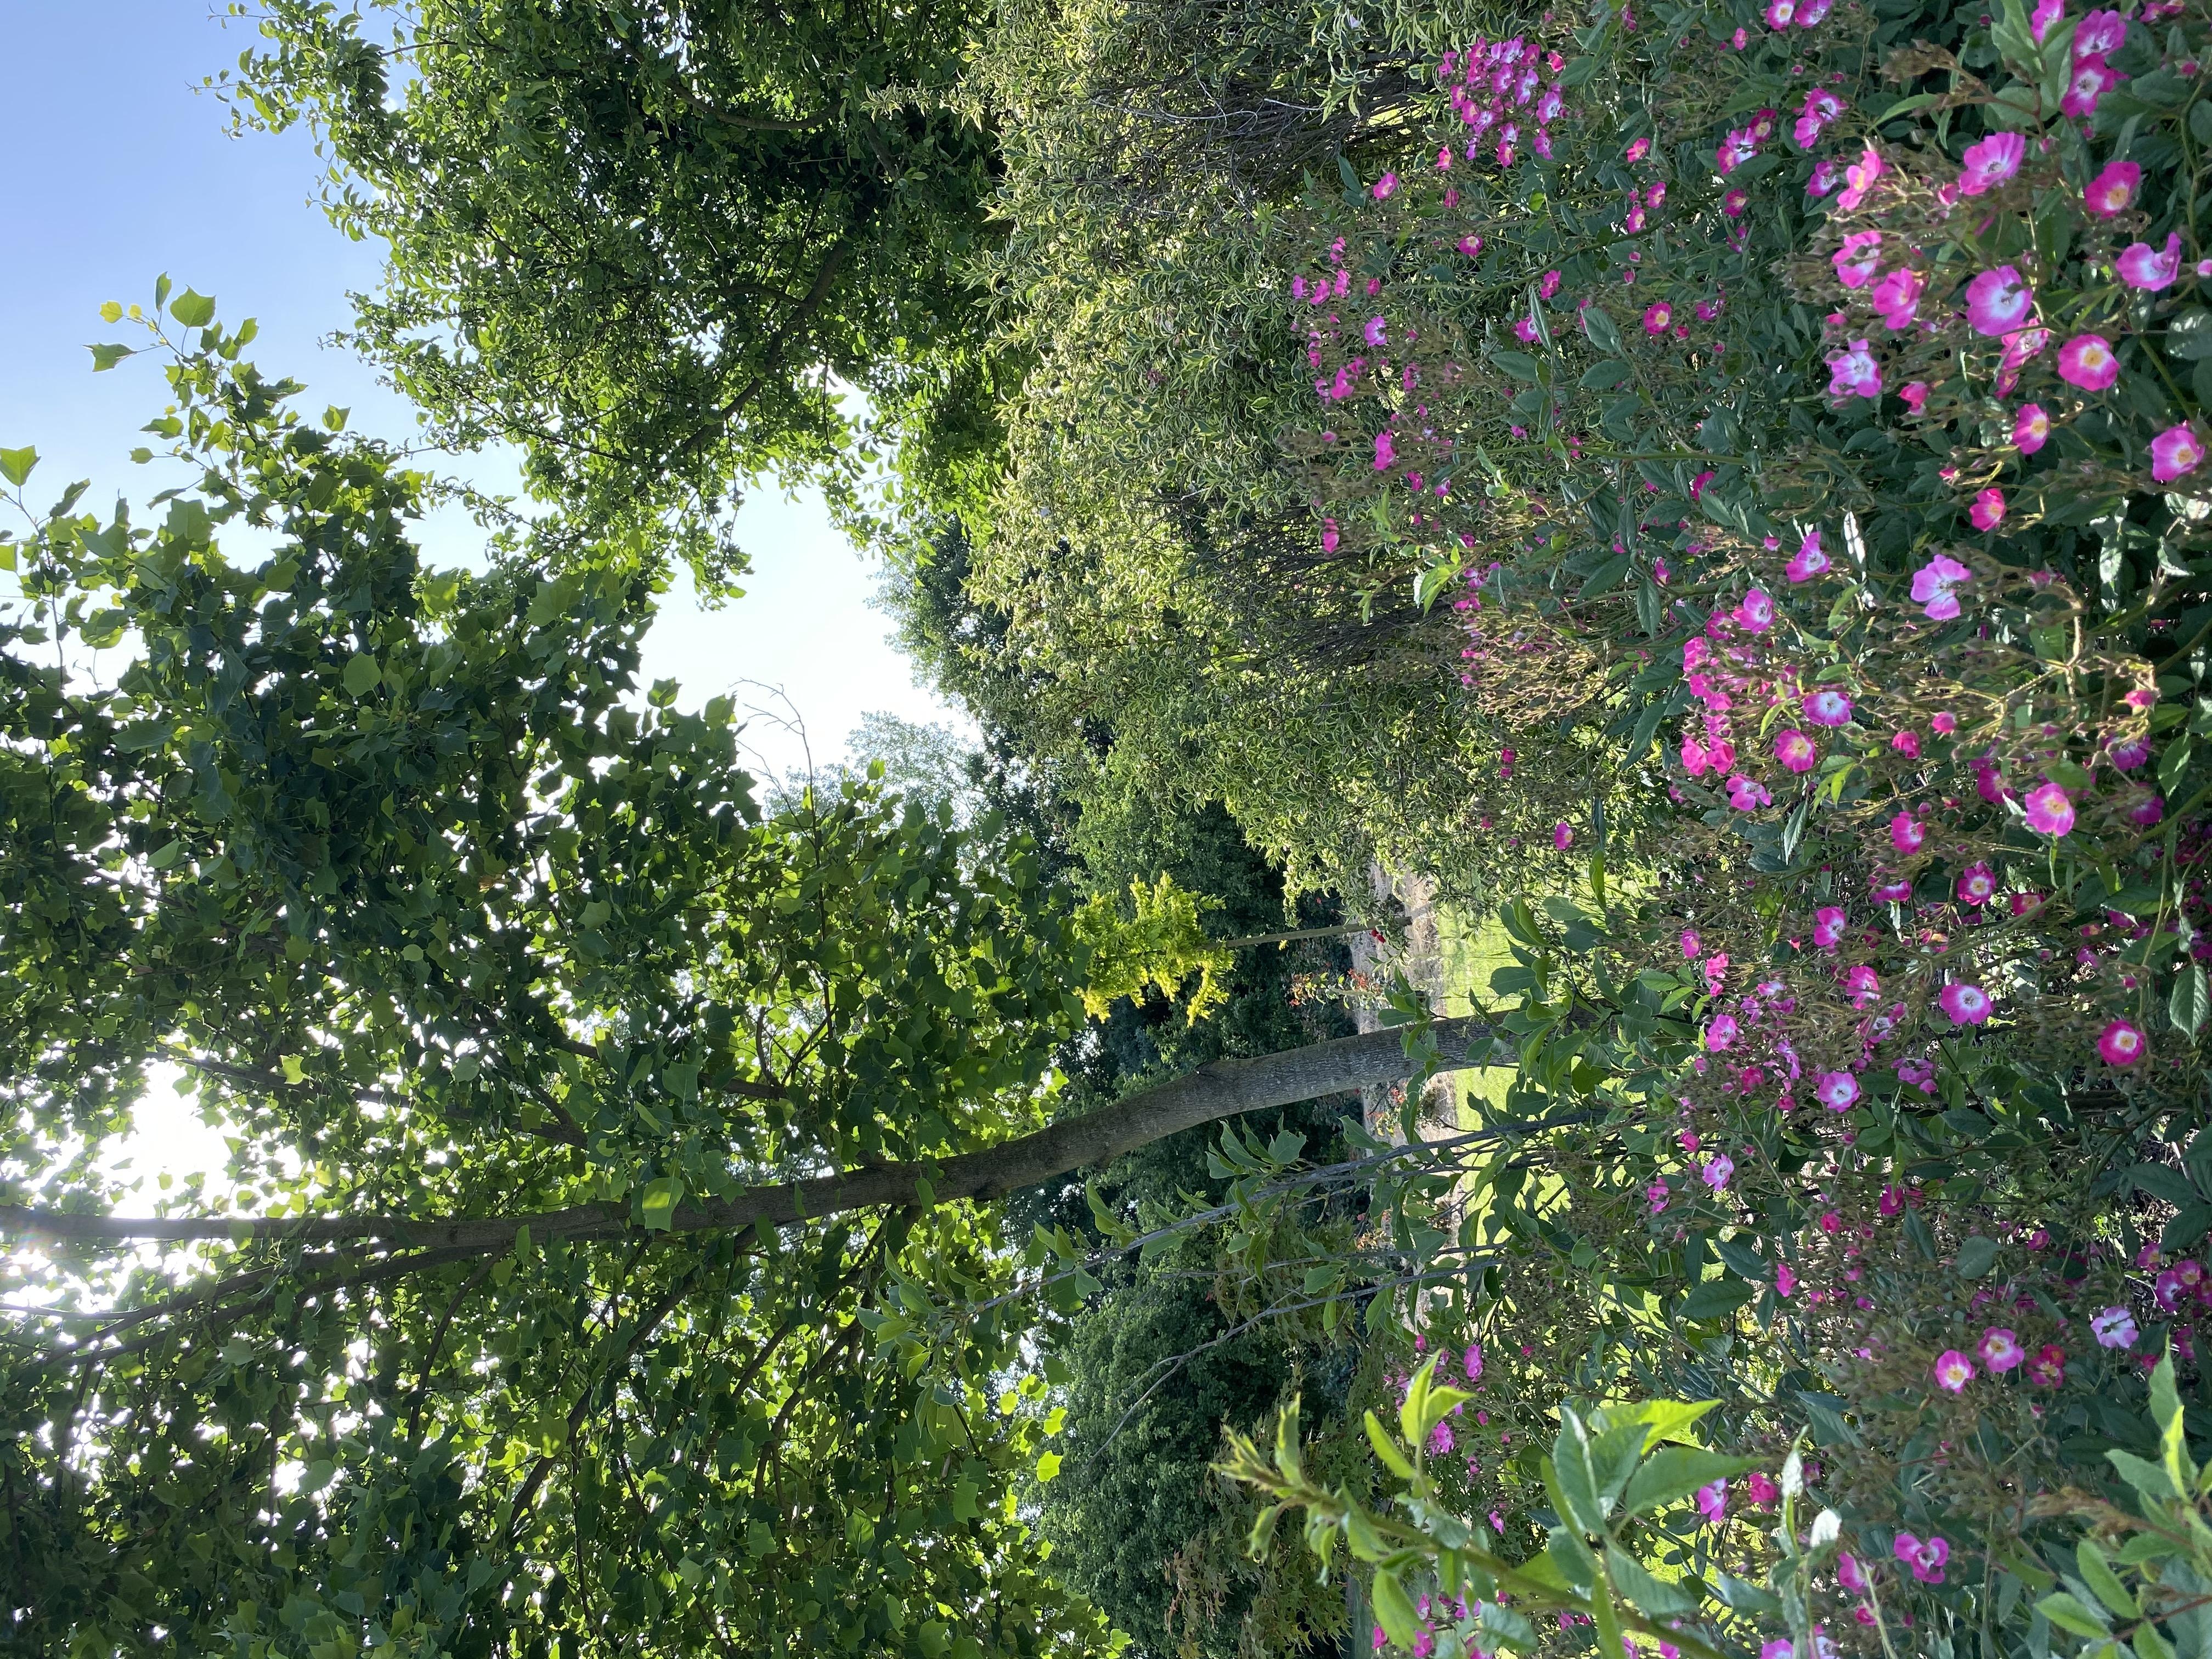 Giardini Visconte roseto